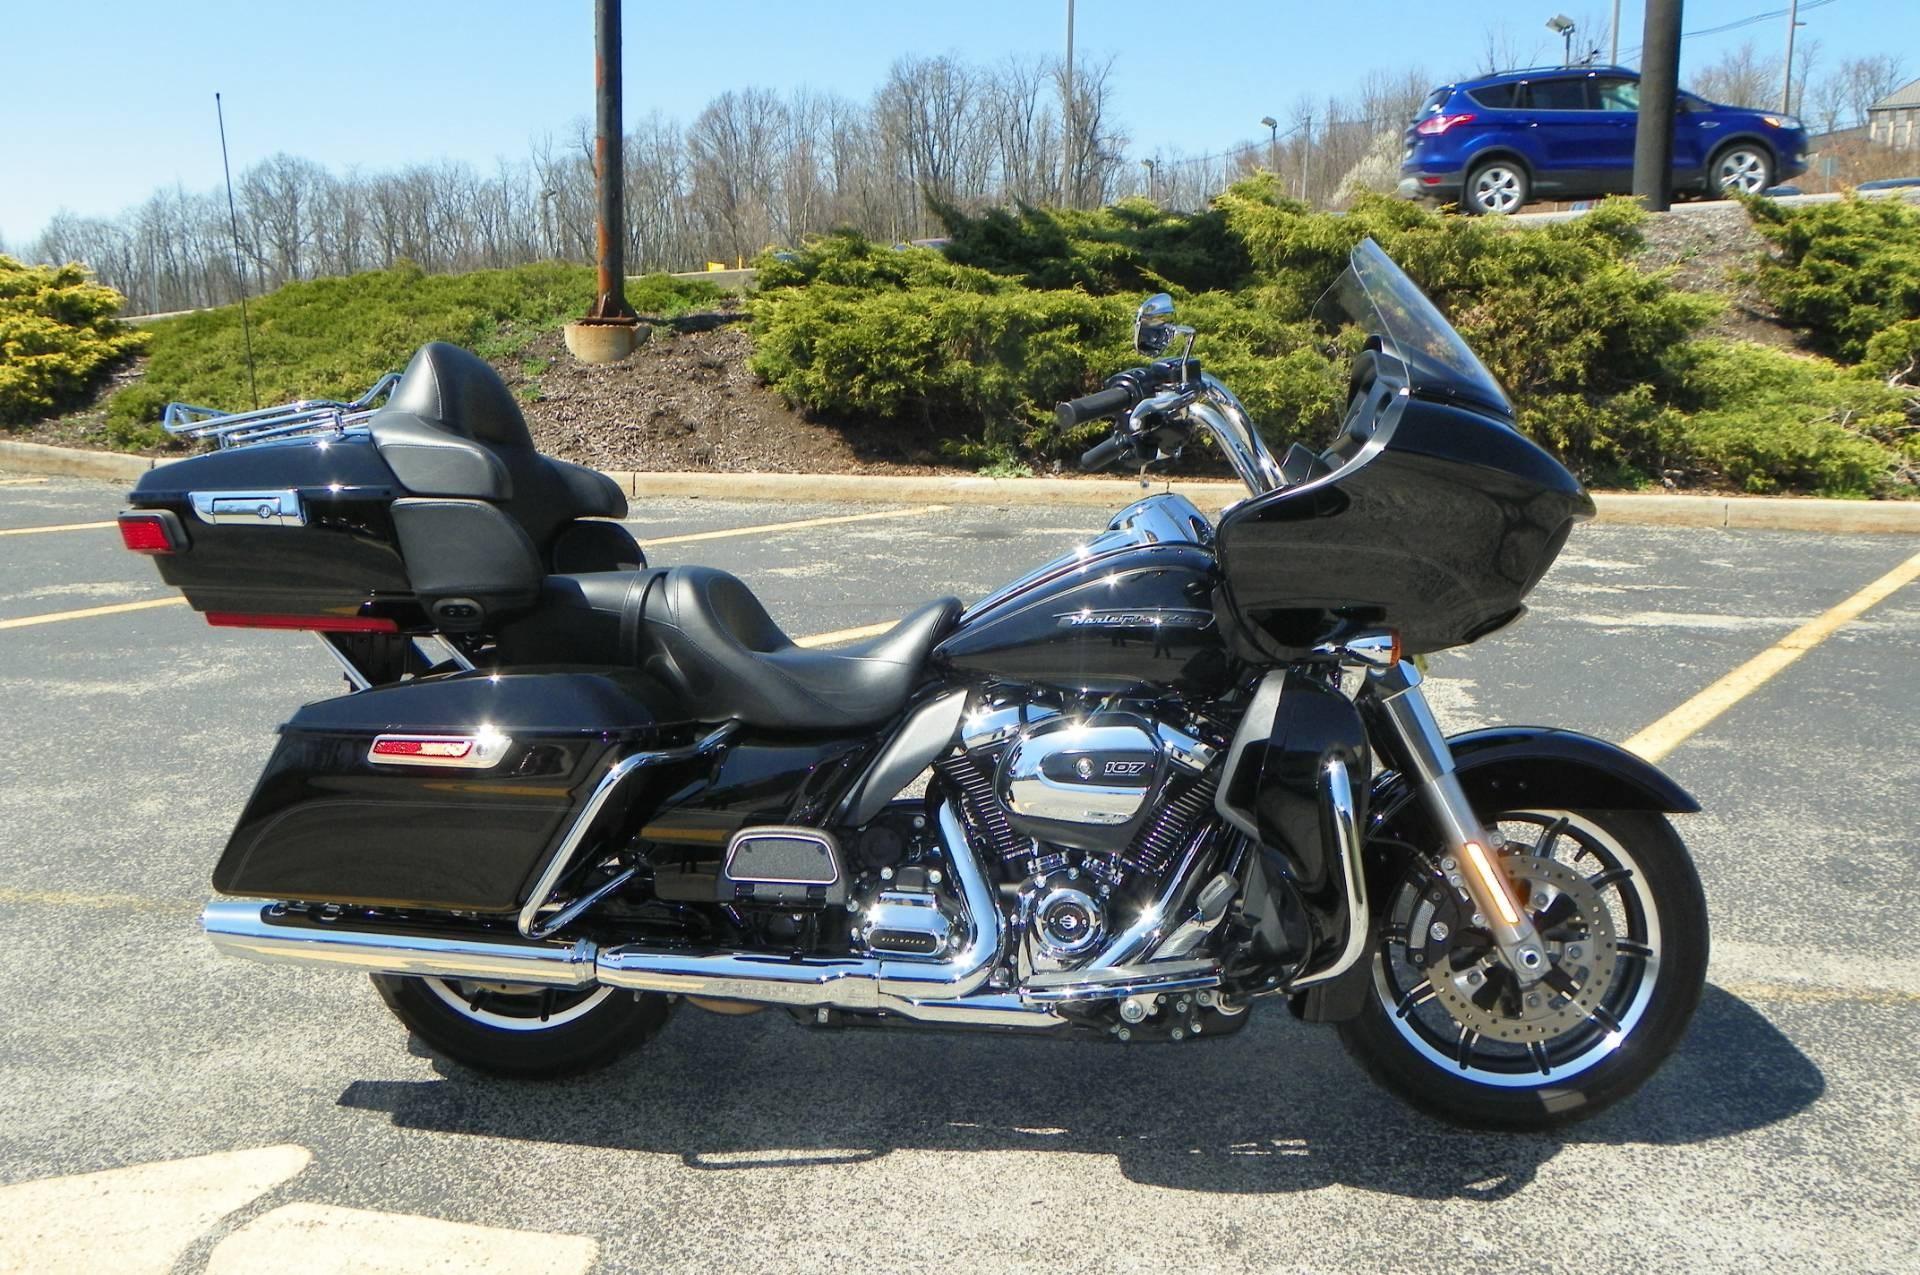 2017 Dyna For Sale Washington >> 2014 and Newer Harley-Davidson® Touring Road Glide® for Sale near Braddock Hills, PA (16 Bikes ...